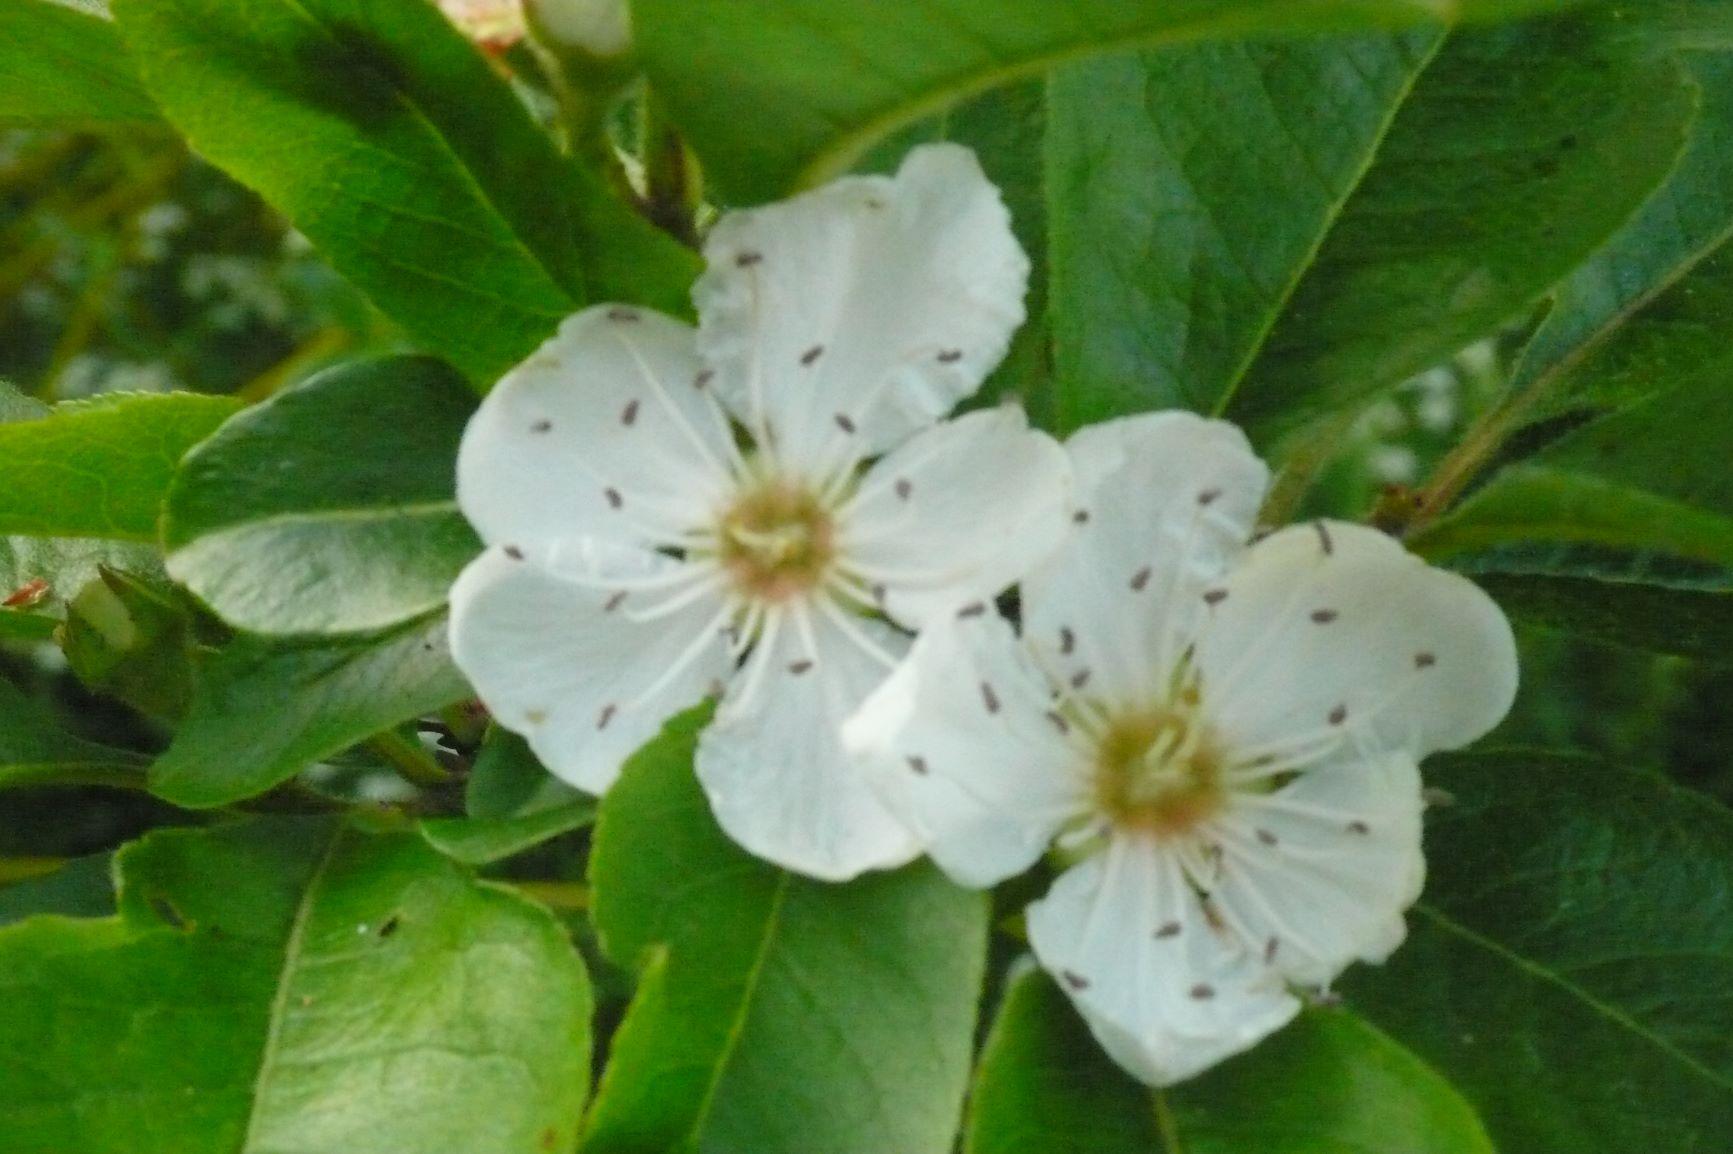 X Crataemespilis grandiflora